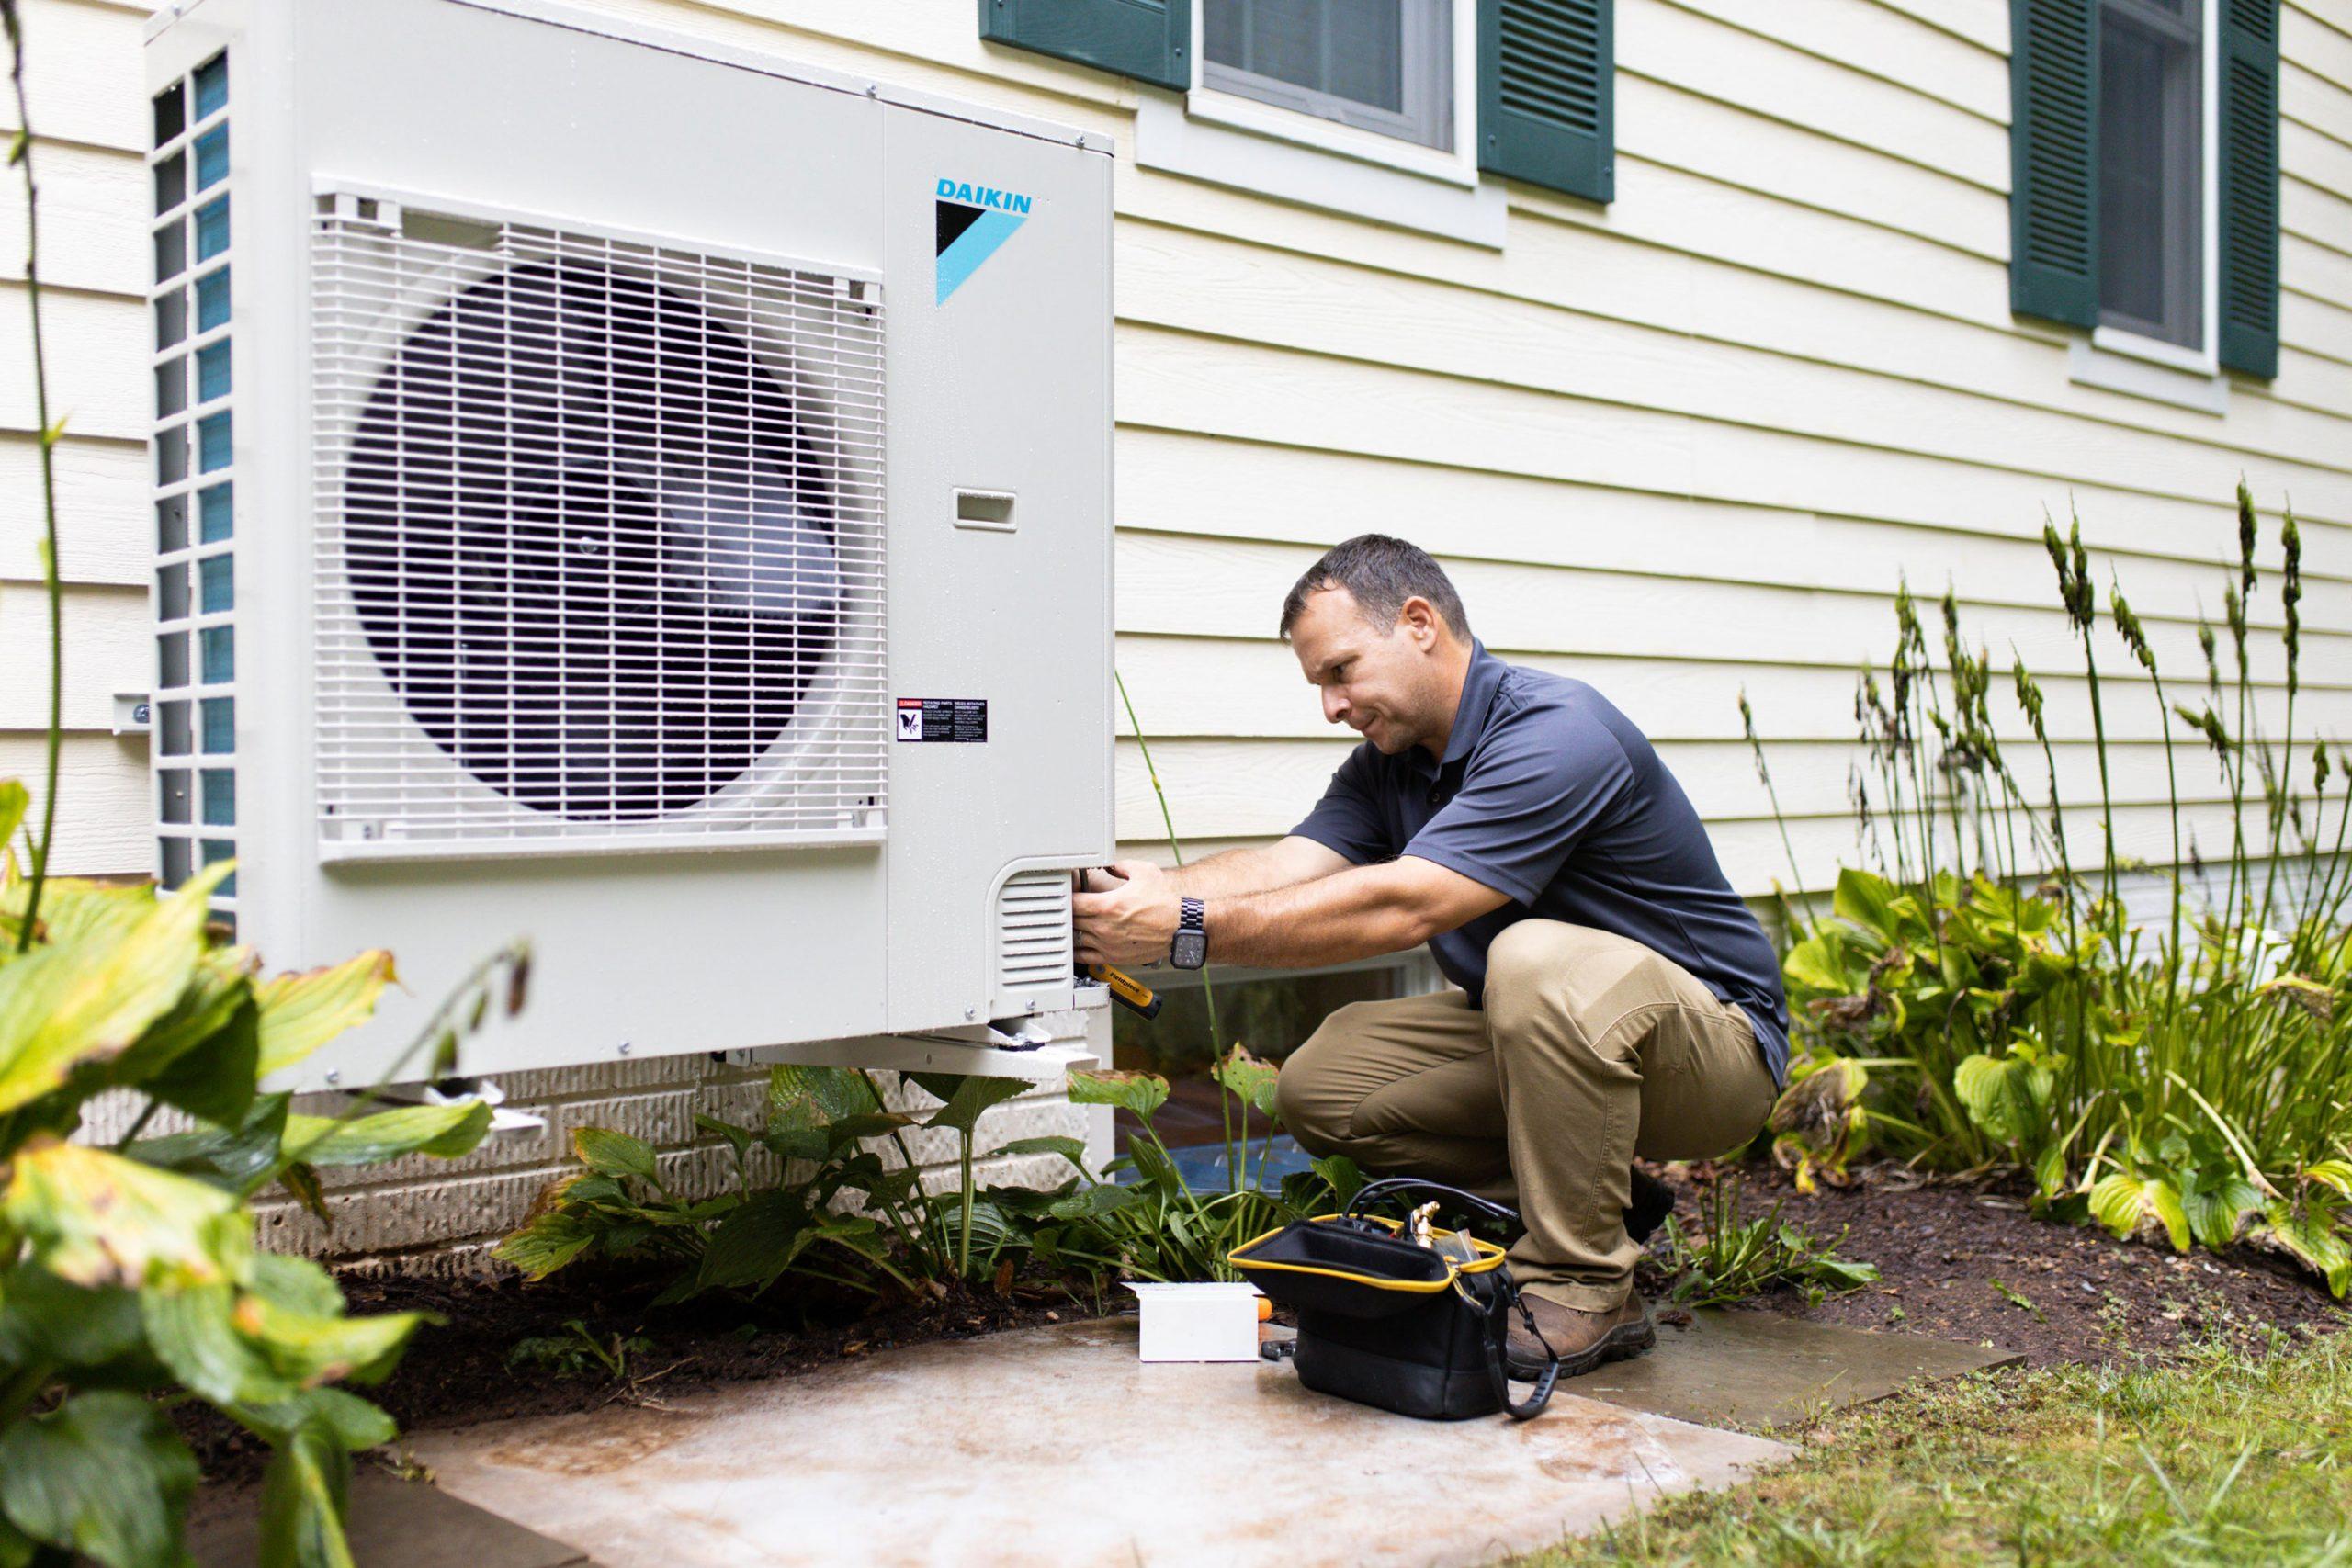 Image of AMSI team member HVAC Experts Daikin System 2